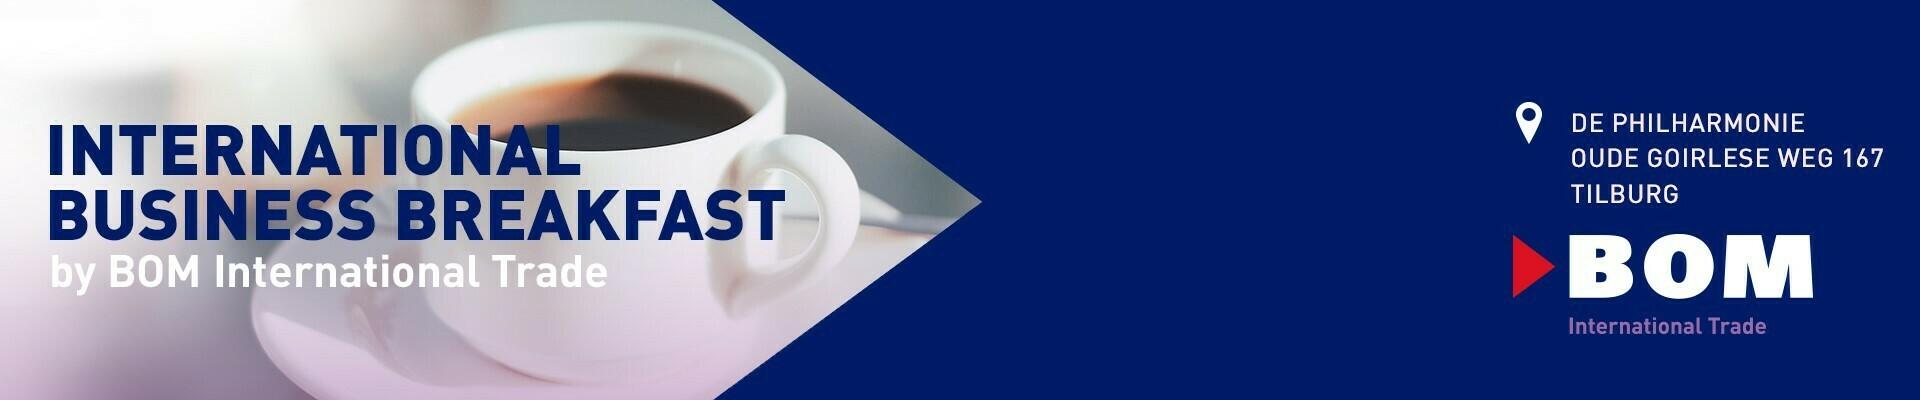 International Business Breakfast - Israel